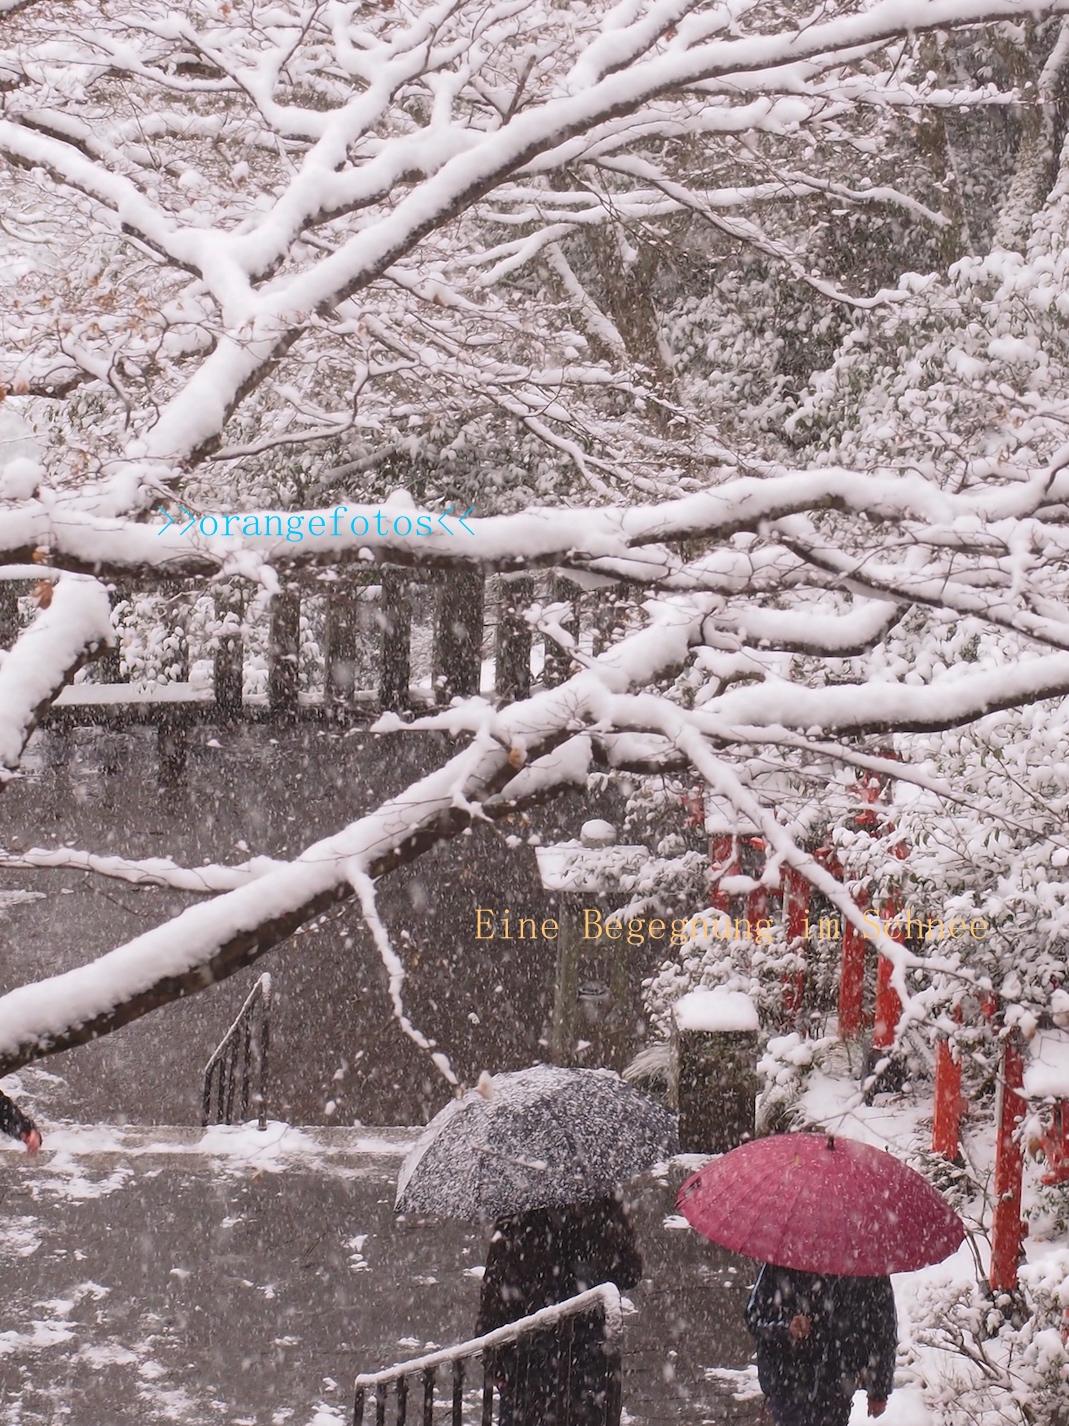 2 Regenschirme im Schneefall.jpg